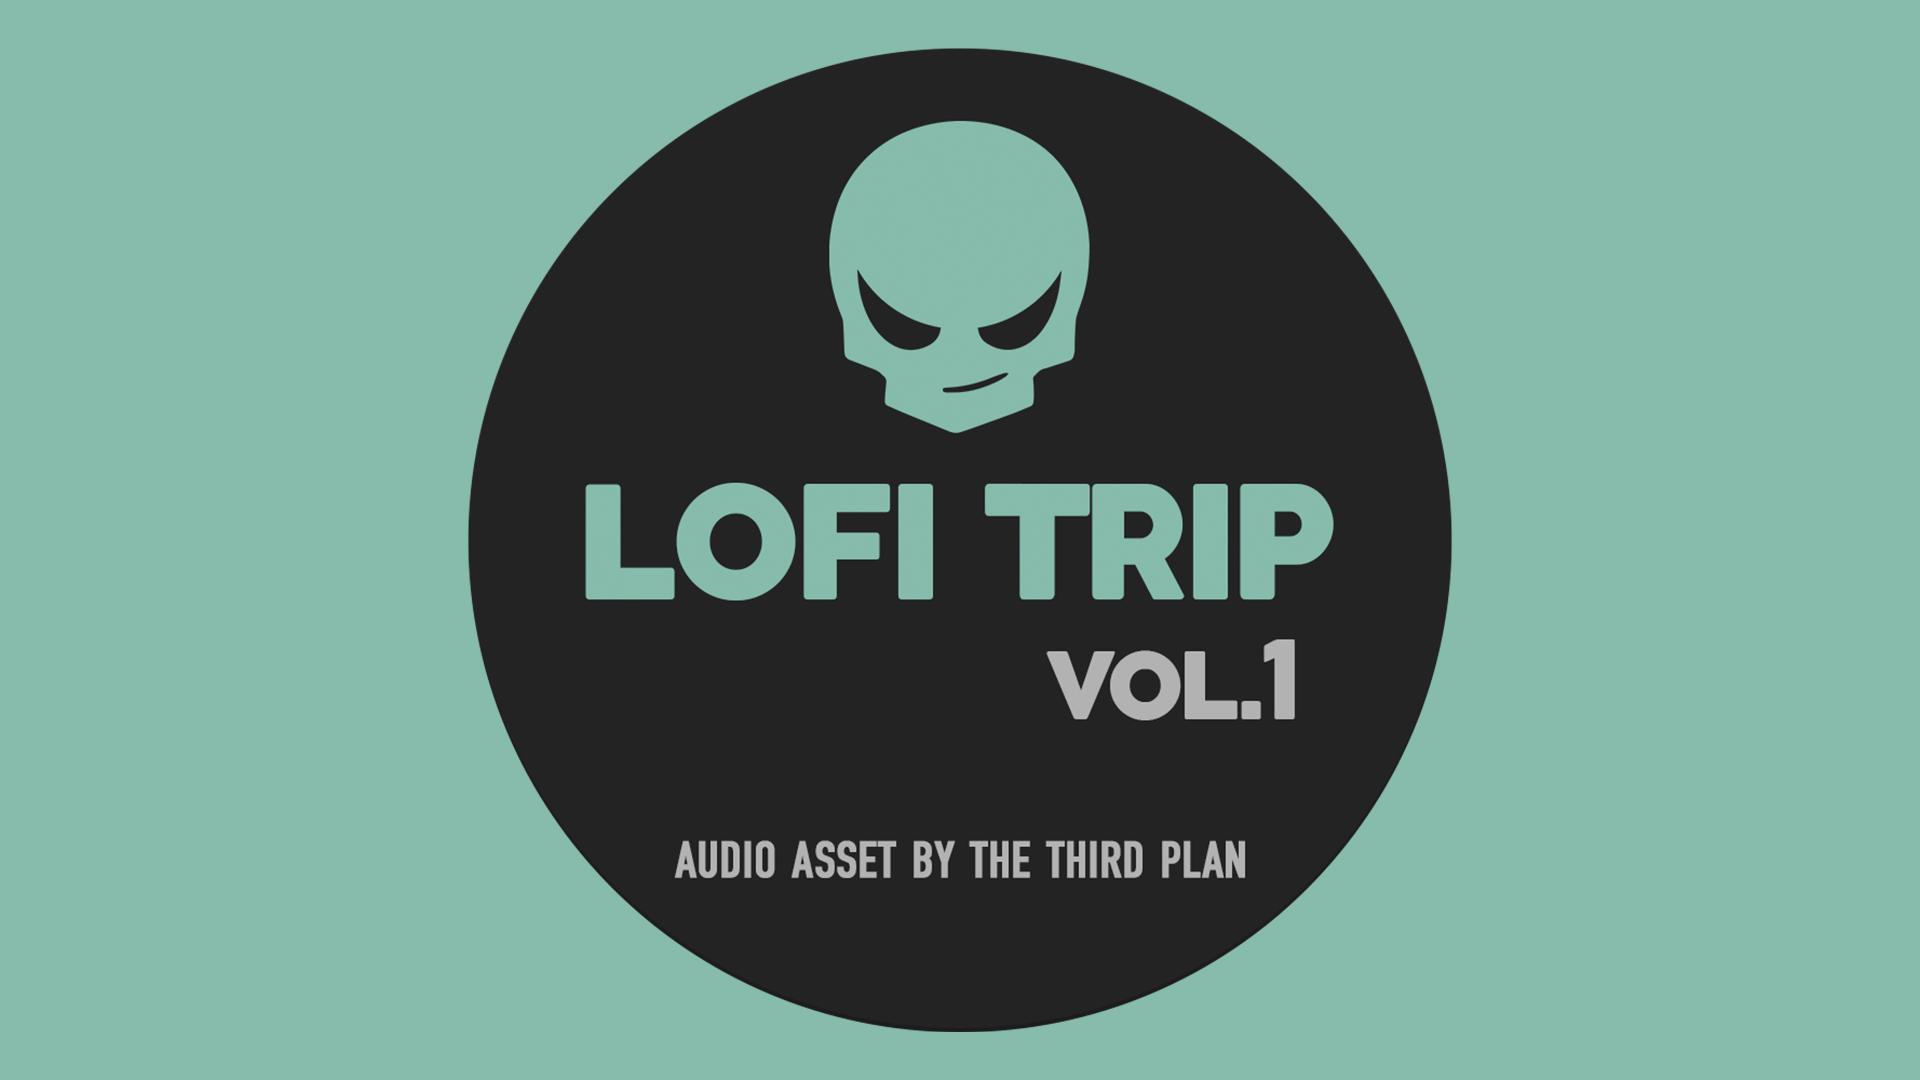 LOFI Trip Vol 1 by WAV MANIACS in Music - UE4 Marketplace